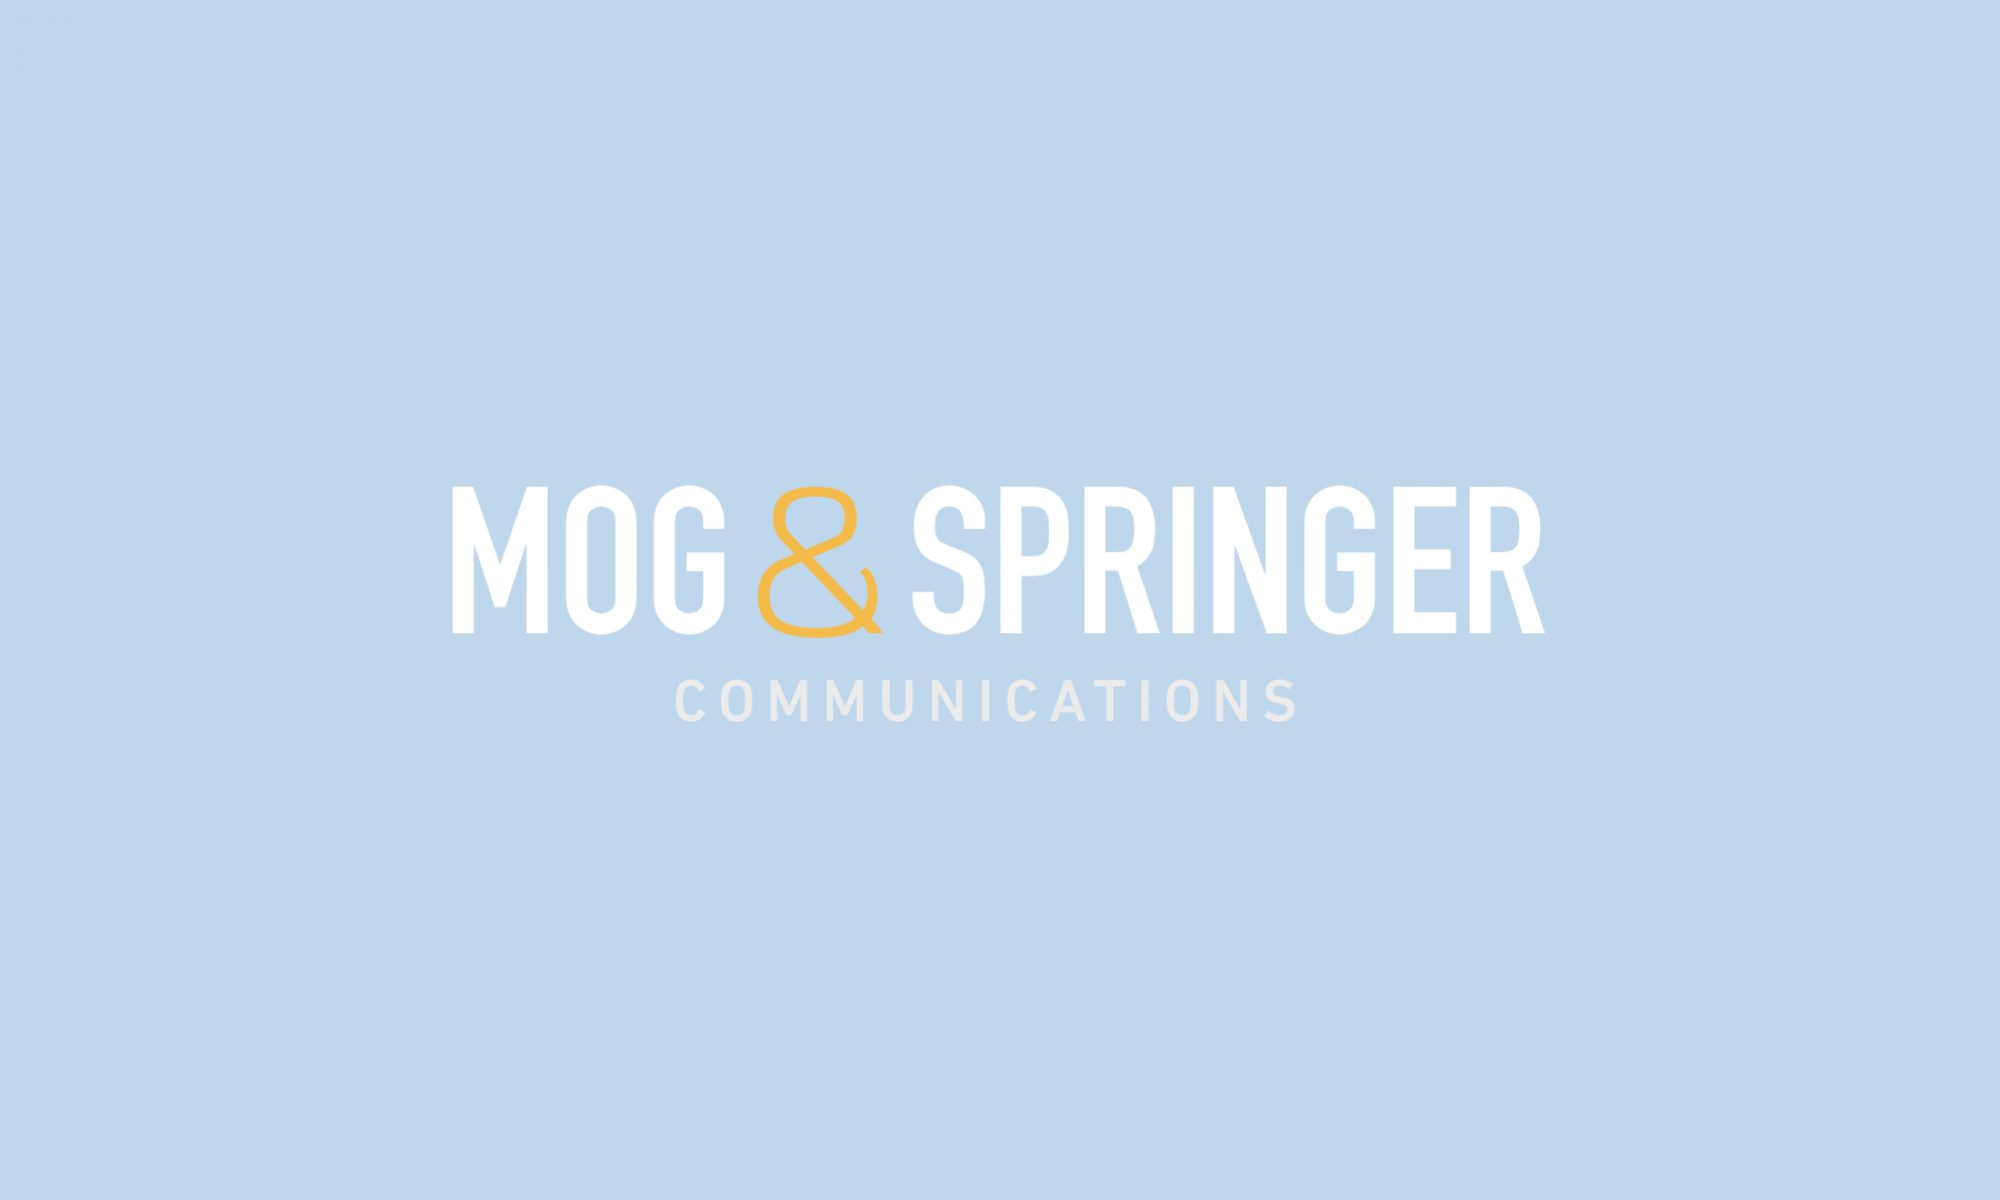 Mog & Springer Communications